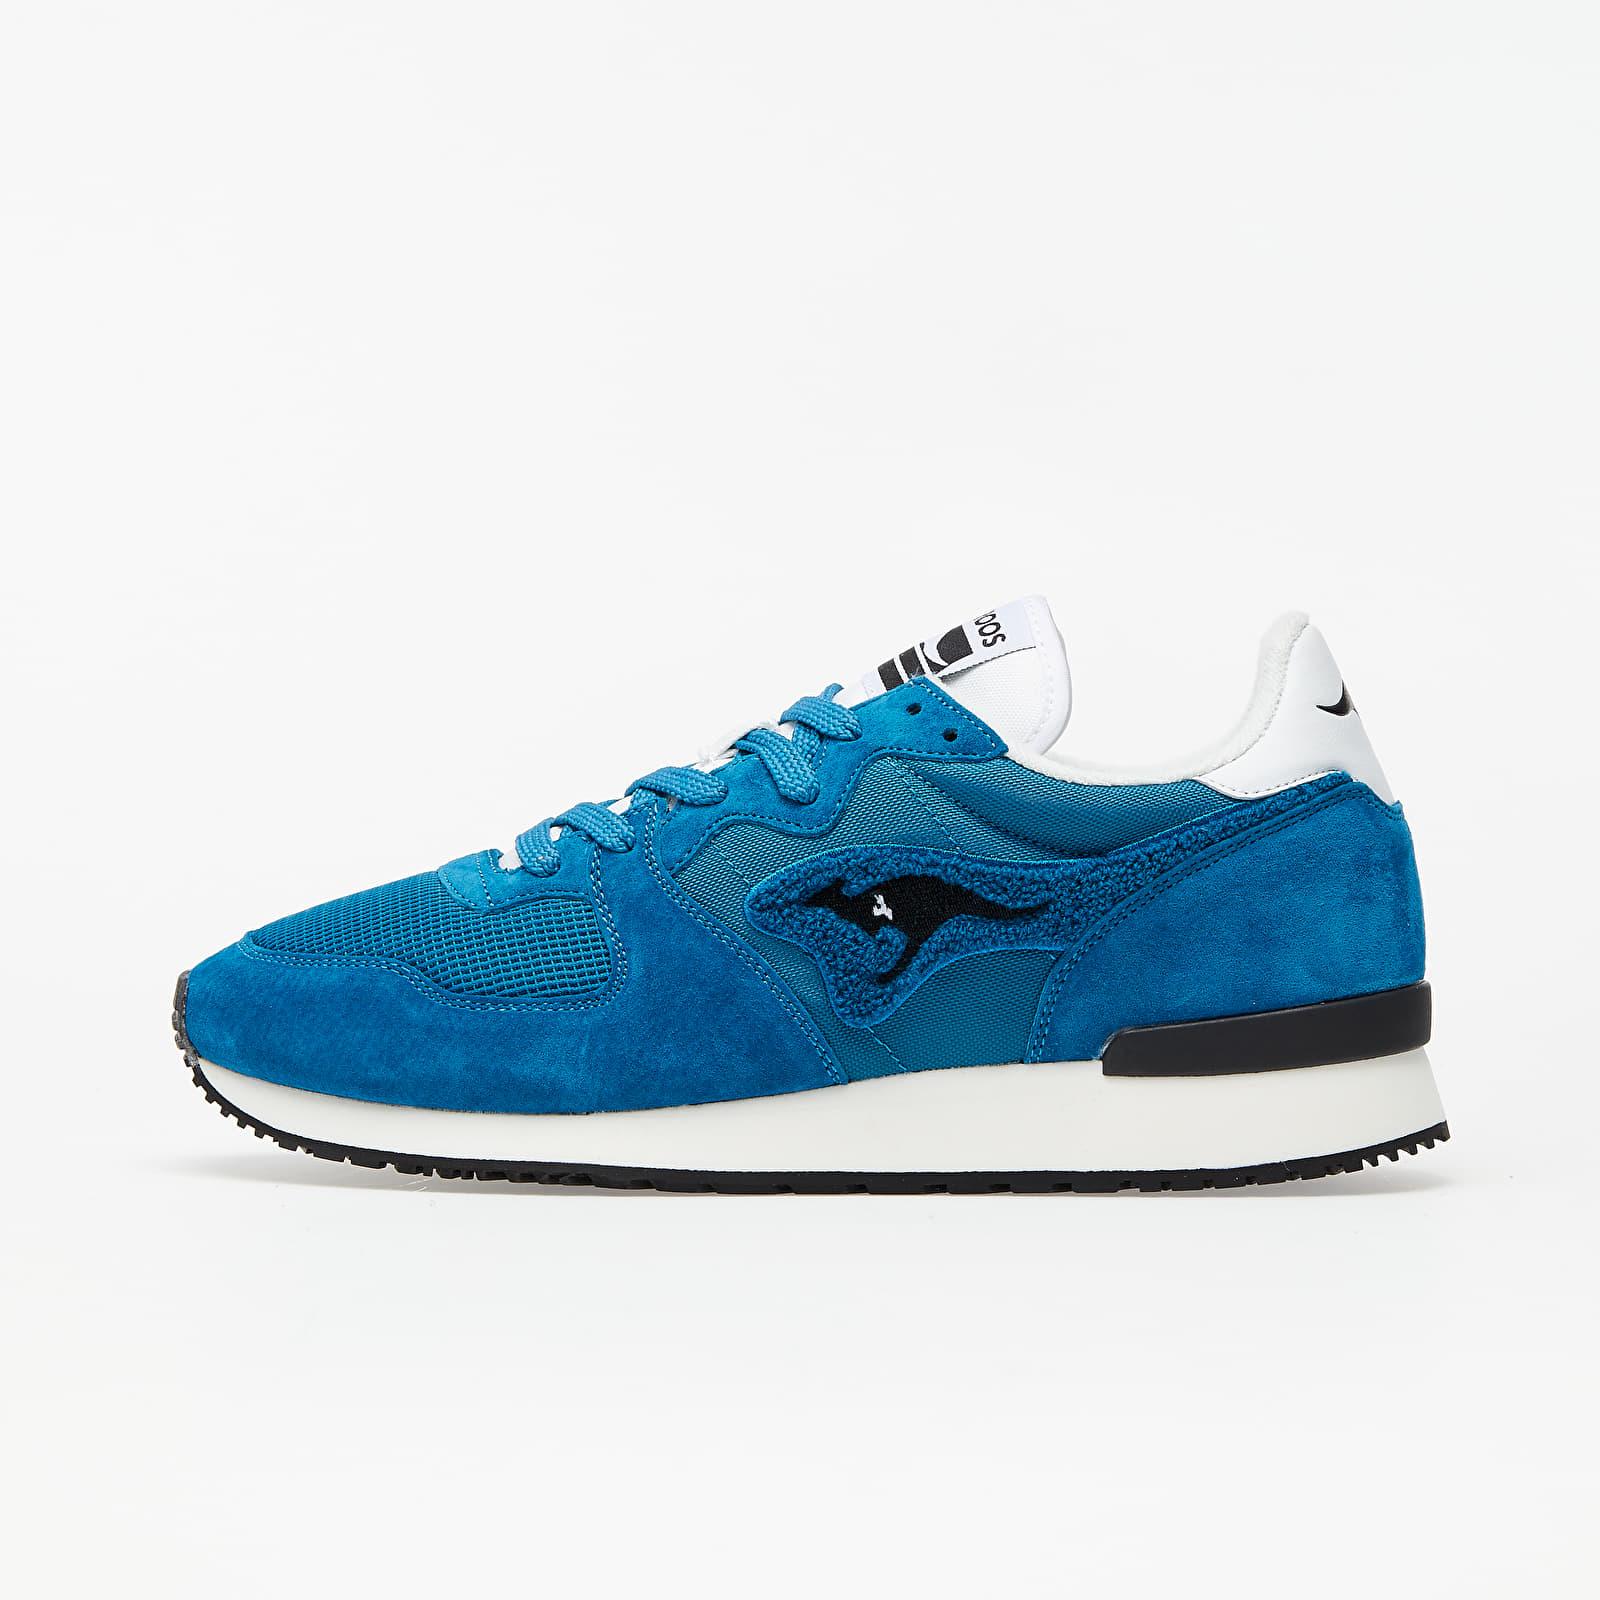 KangaROOS Aussie Blue 472680004000